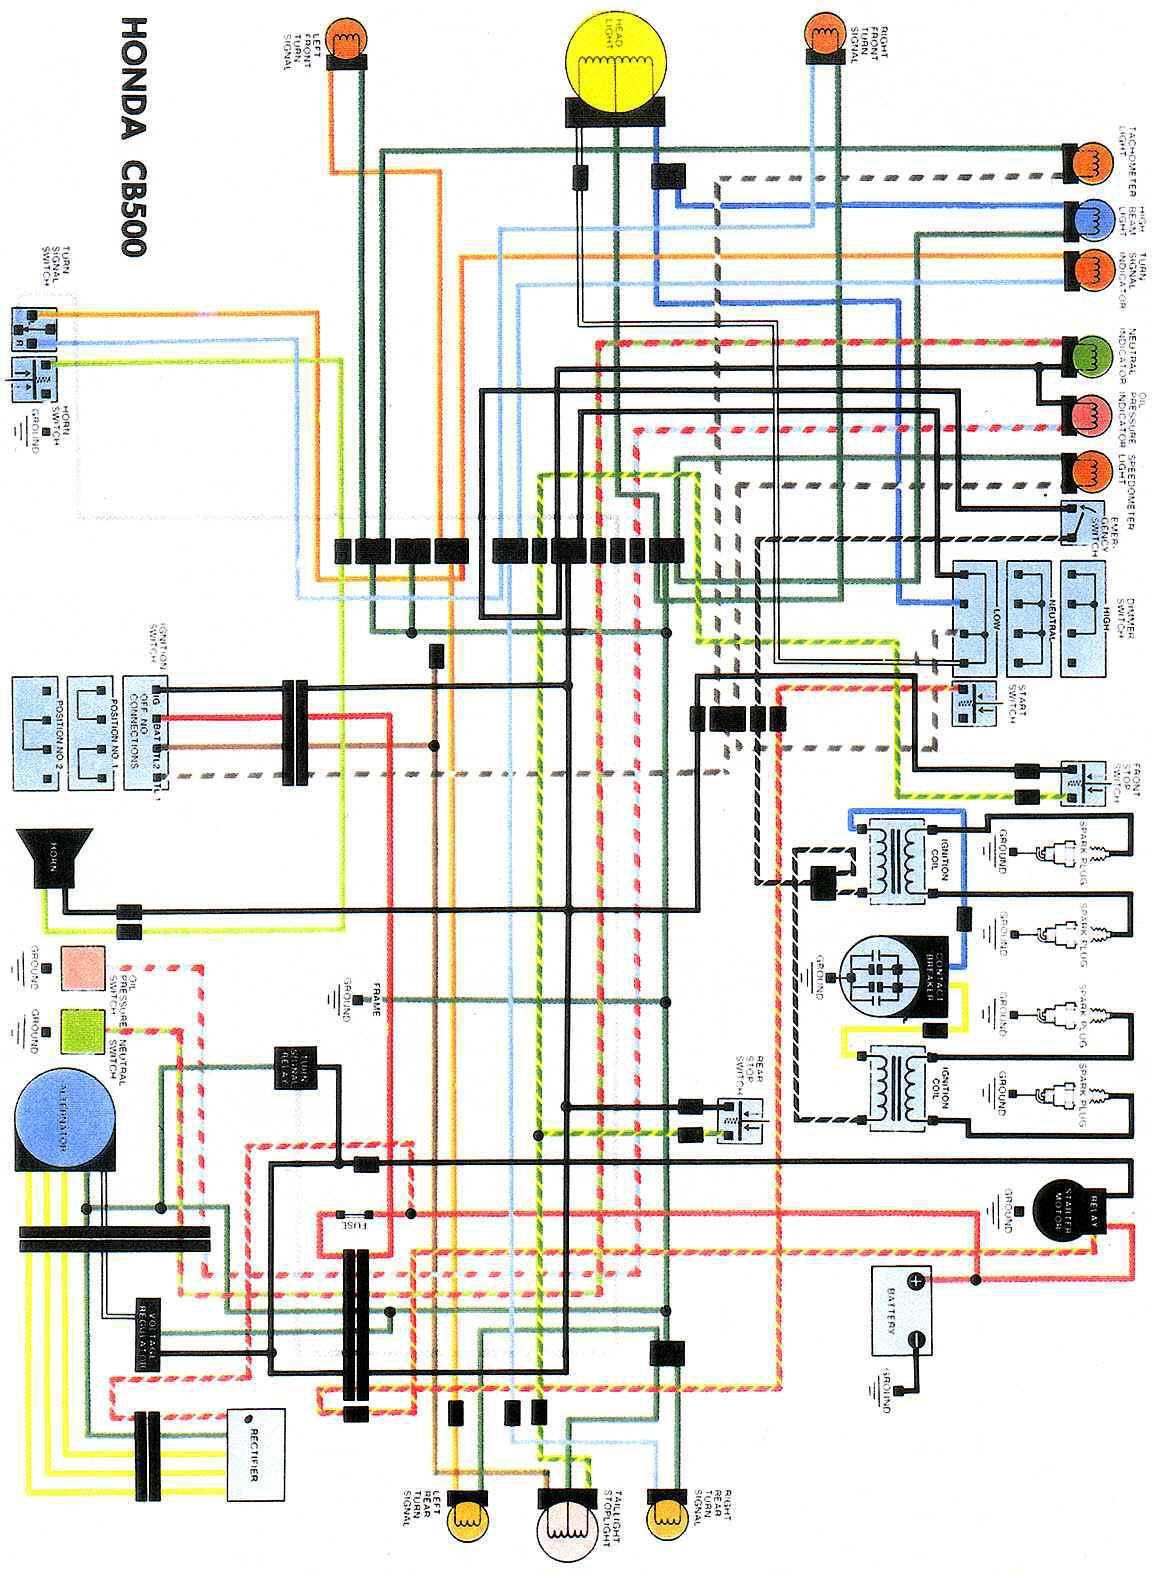 motorcycle honda shadow wiring diagram vr 6672  vt500 wiring diagram free diagram  vr 6672  vt500 wiring diagram free diagram